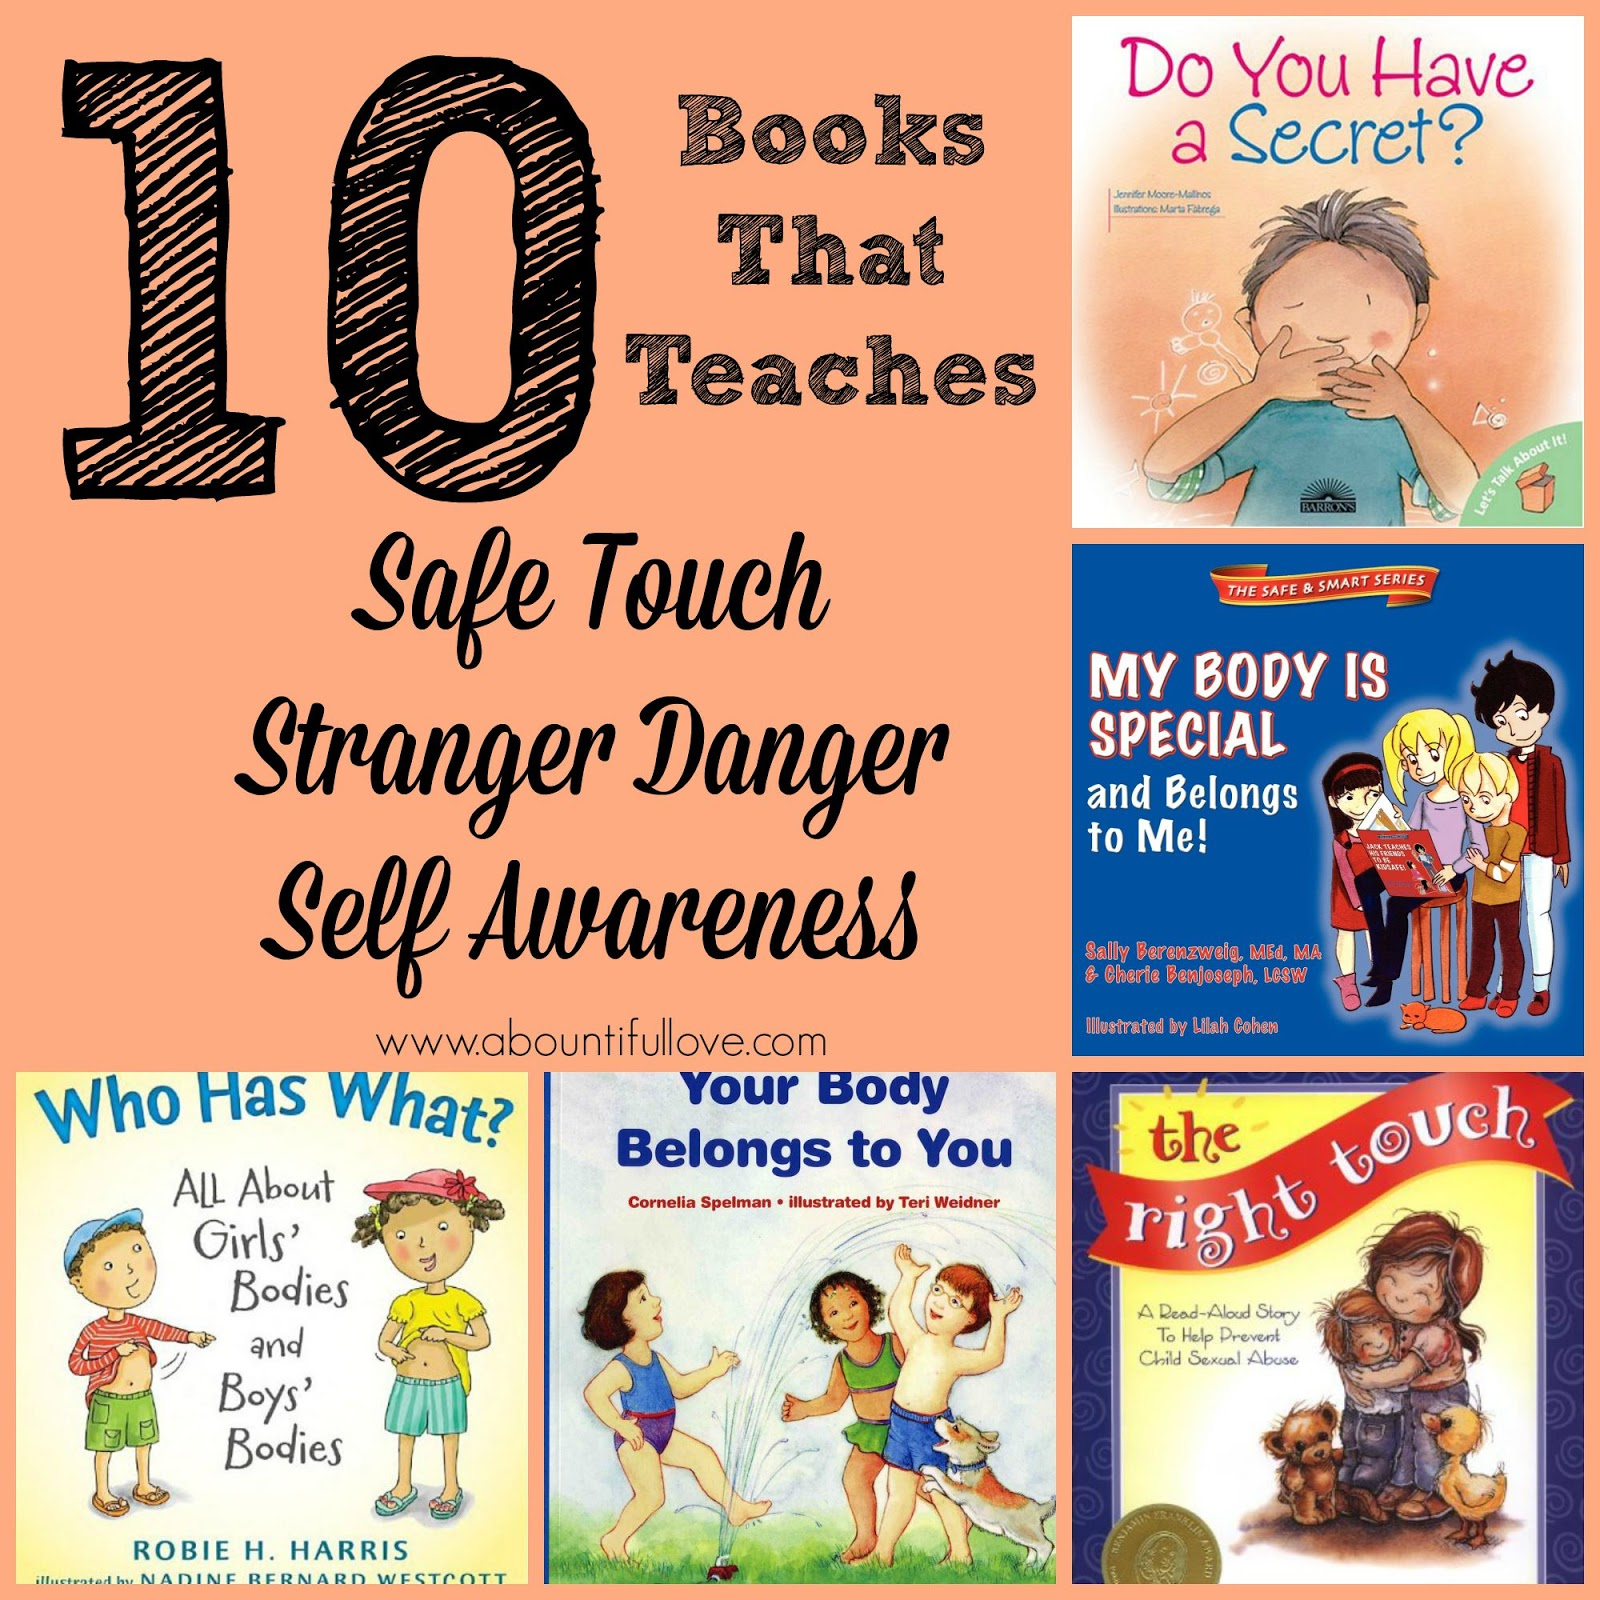 10 Books That Teaches Safe Touch Stranger Danger And Self